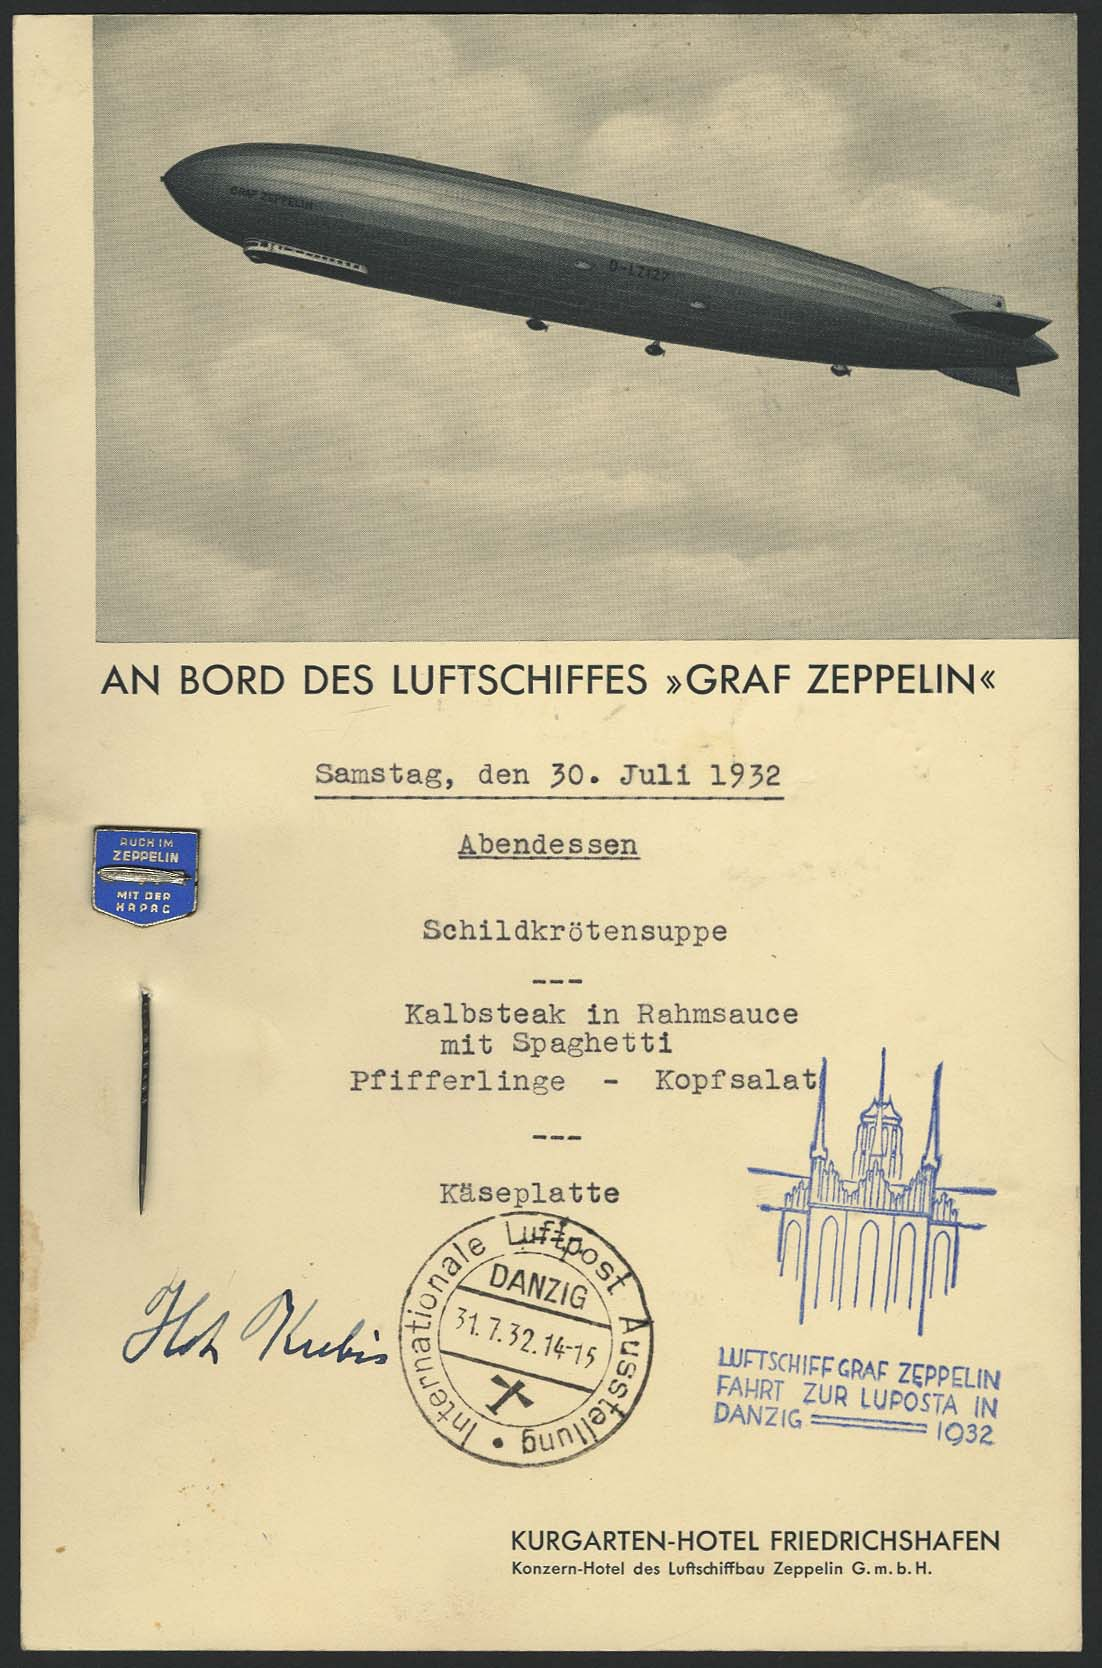 Lot 4113 - Zeppelin-Memorabilien Memorabilien -  Auktionshaus Ulrich Felzmann GmbH & Co. KG